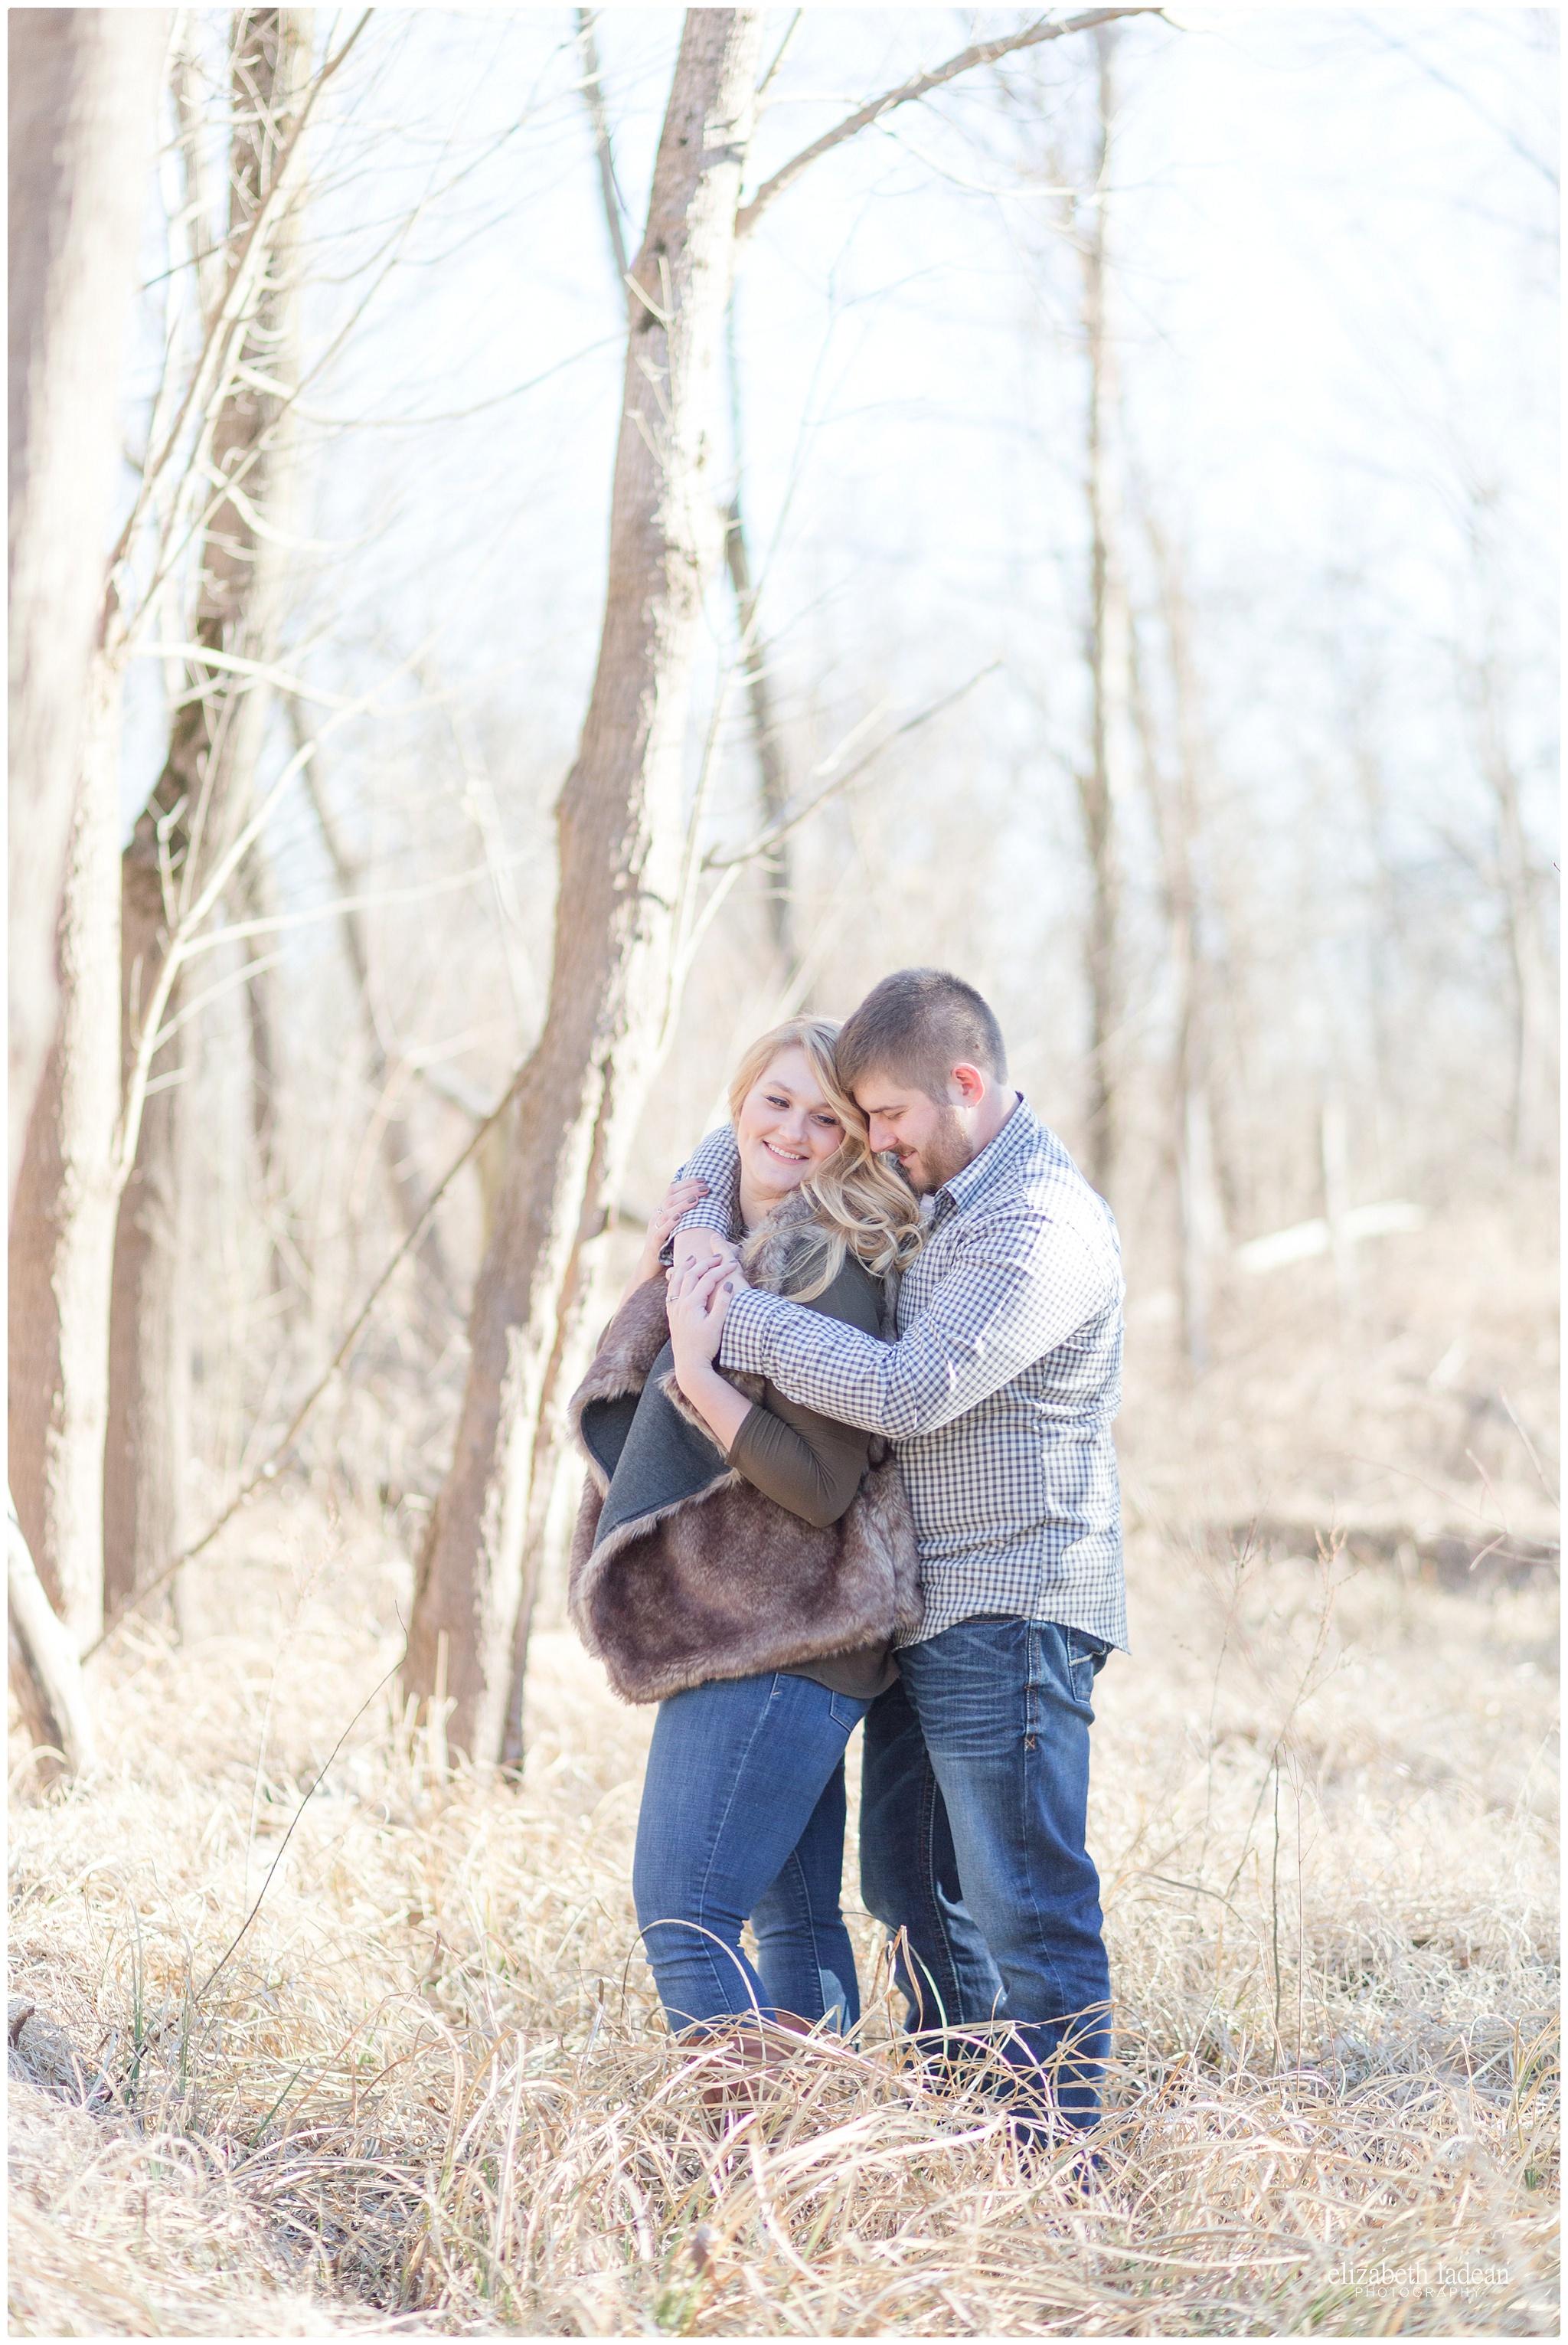 Weston-Bend-State-Park-Engagement-Photos-J+N2017-Elizabeth-Ladean-Photography-photo_0183.jpg